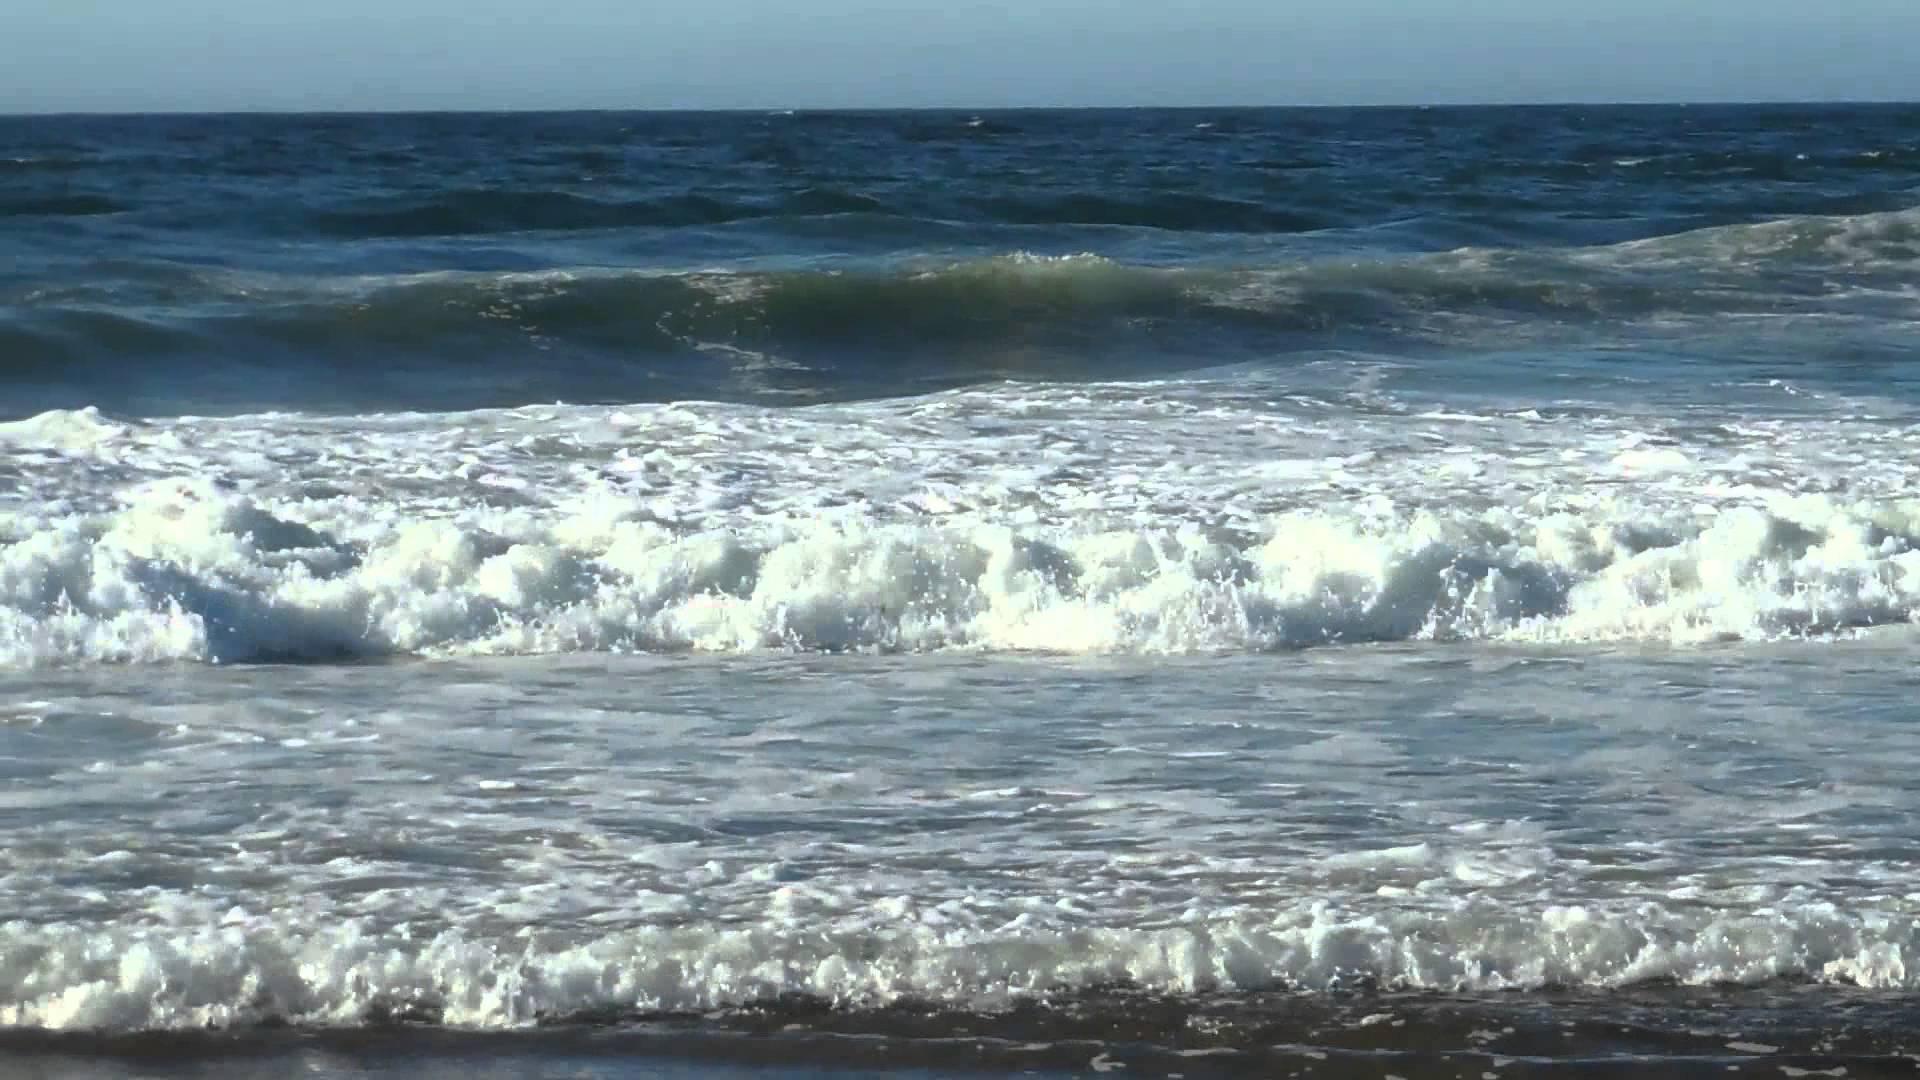 Point Reyes Seashore Waves - YouTube